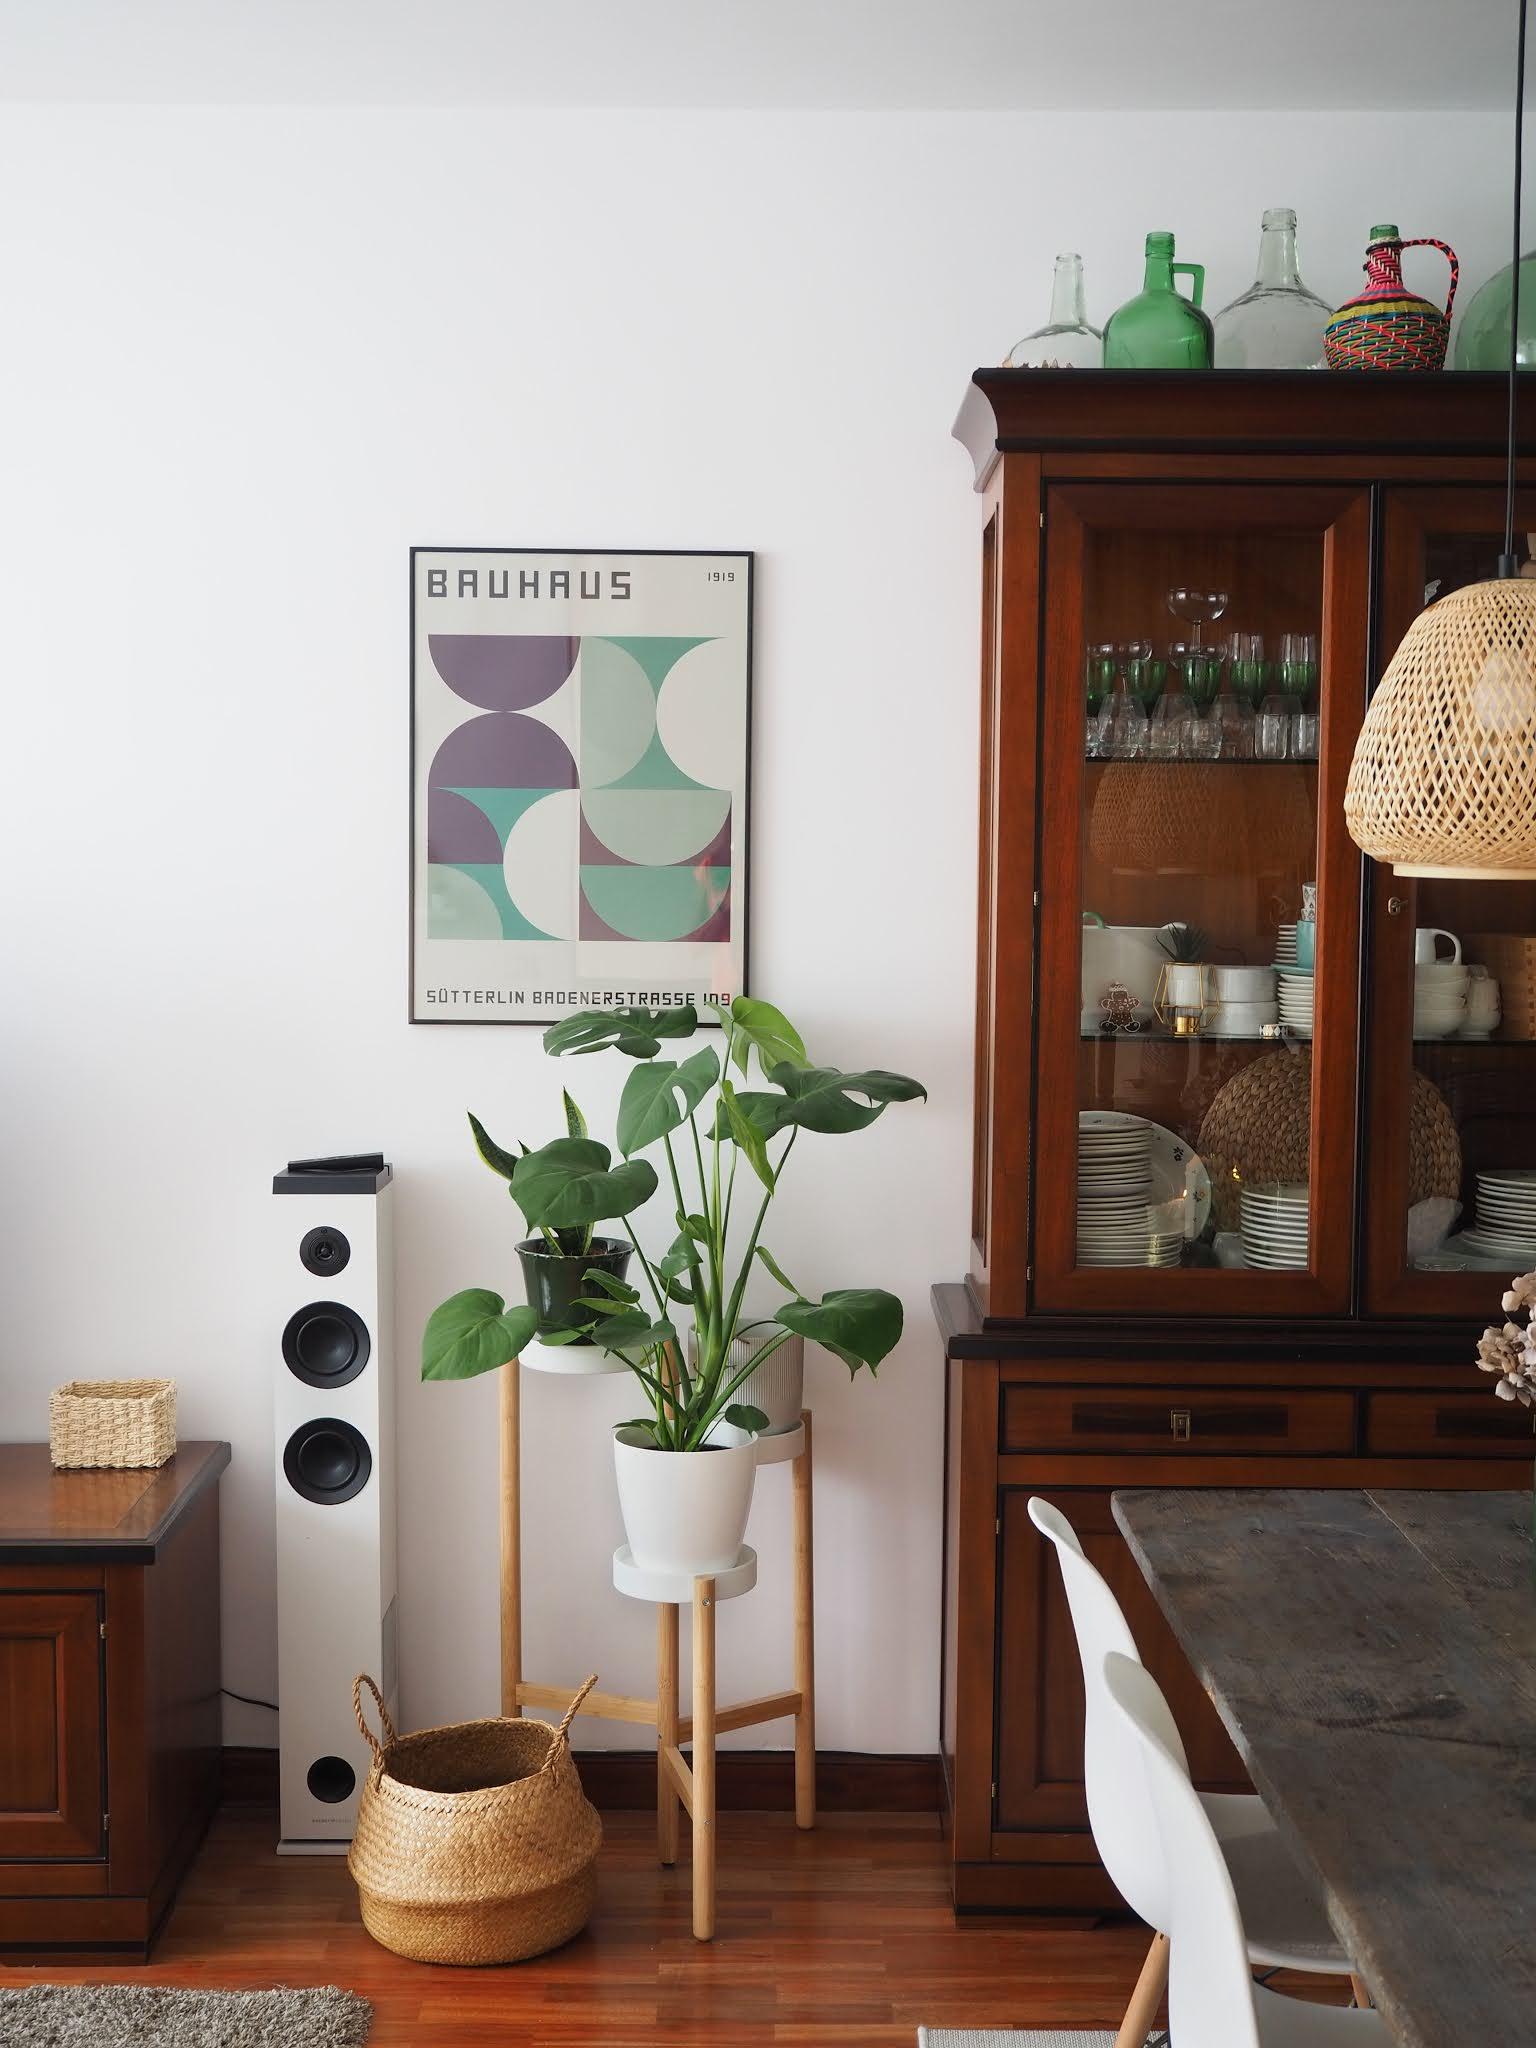 4 trucos para decorar de forma coherente vuestro hogar_14